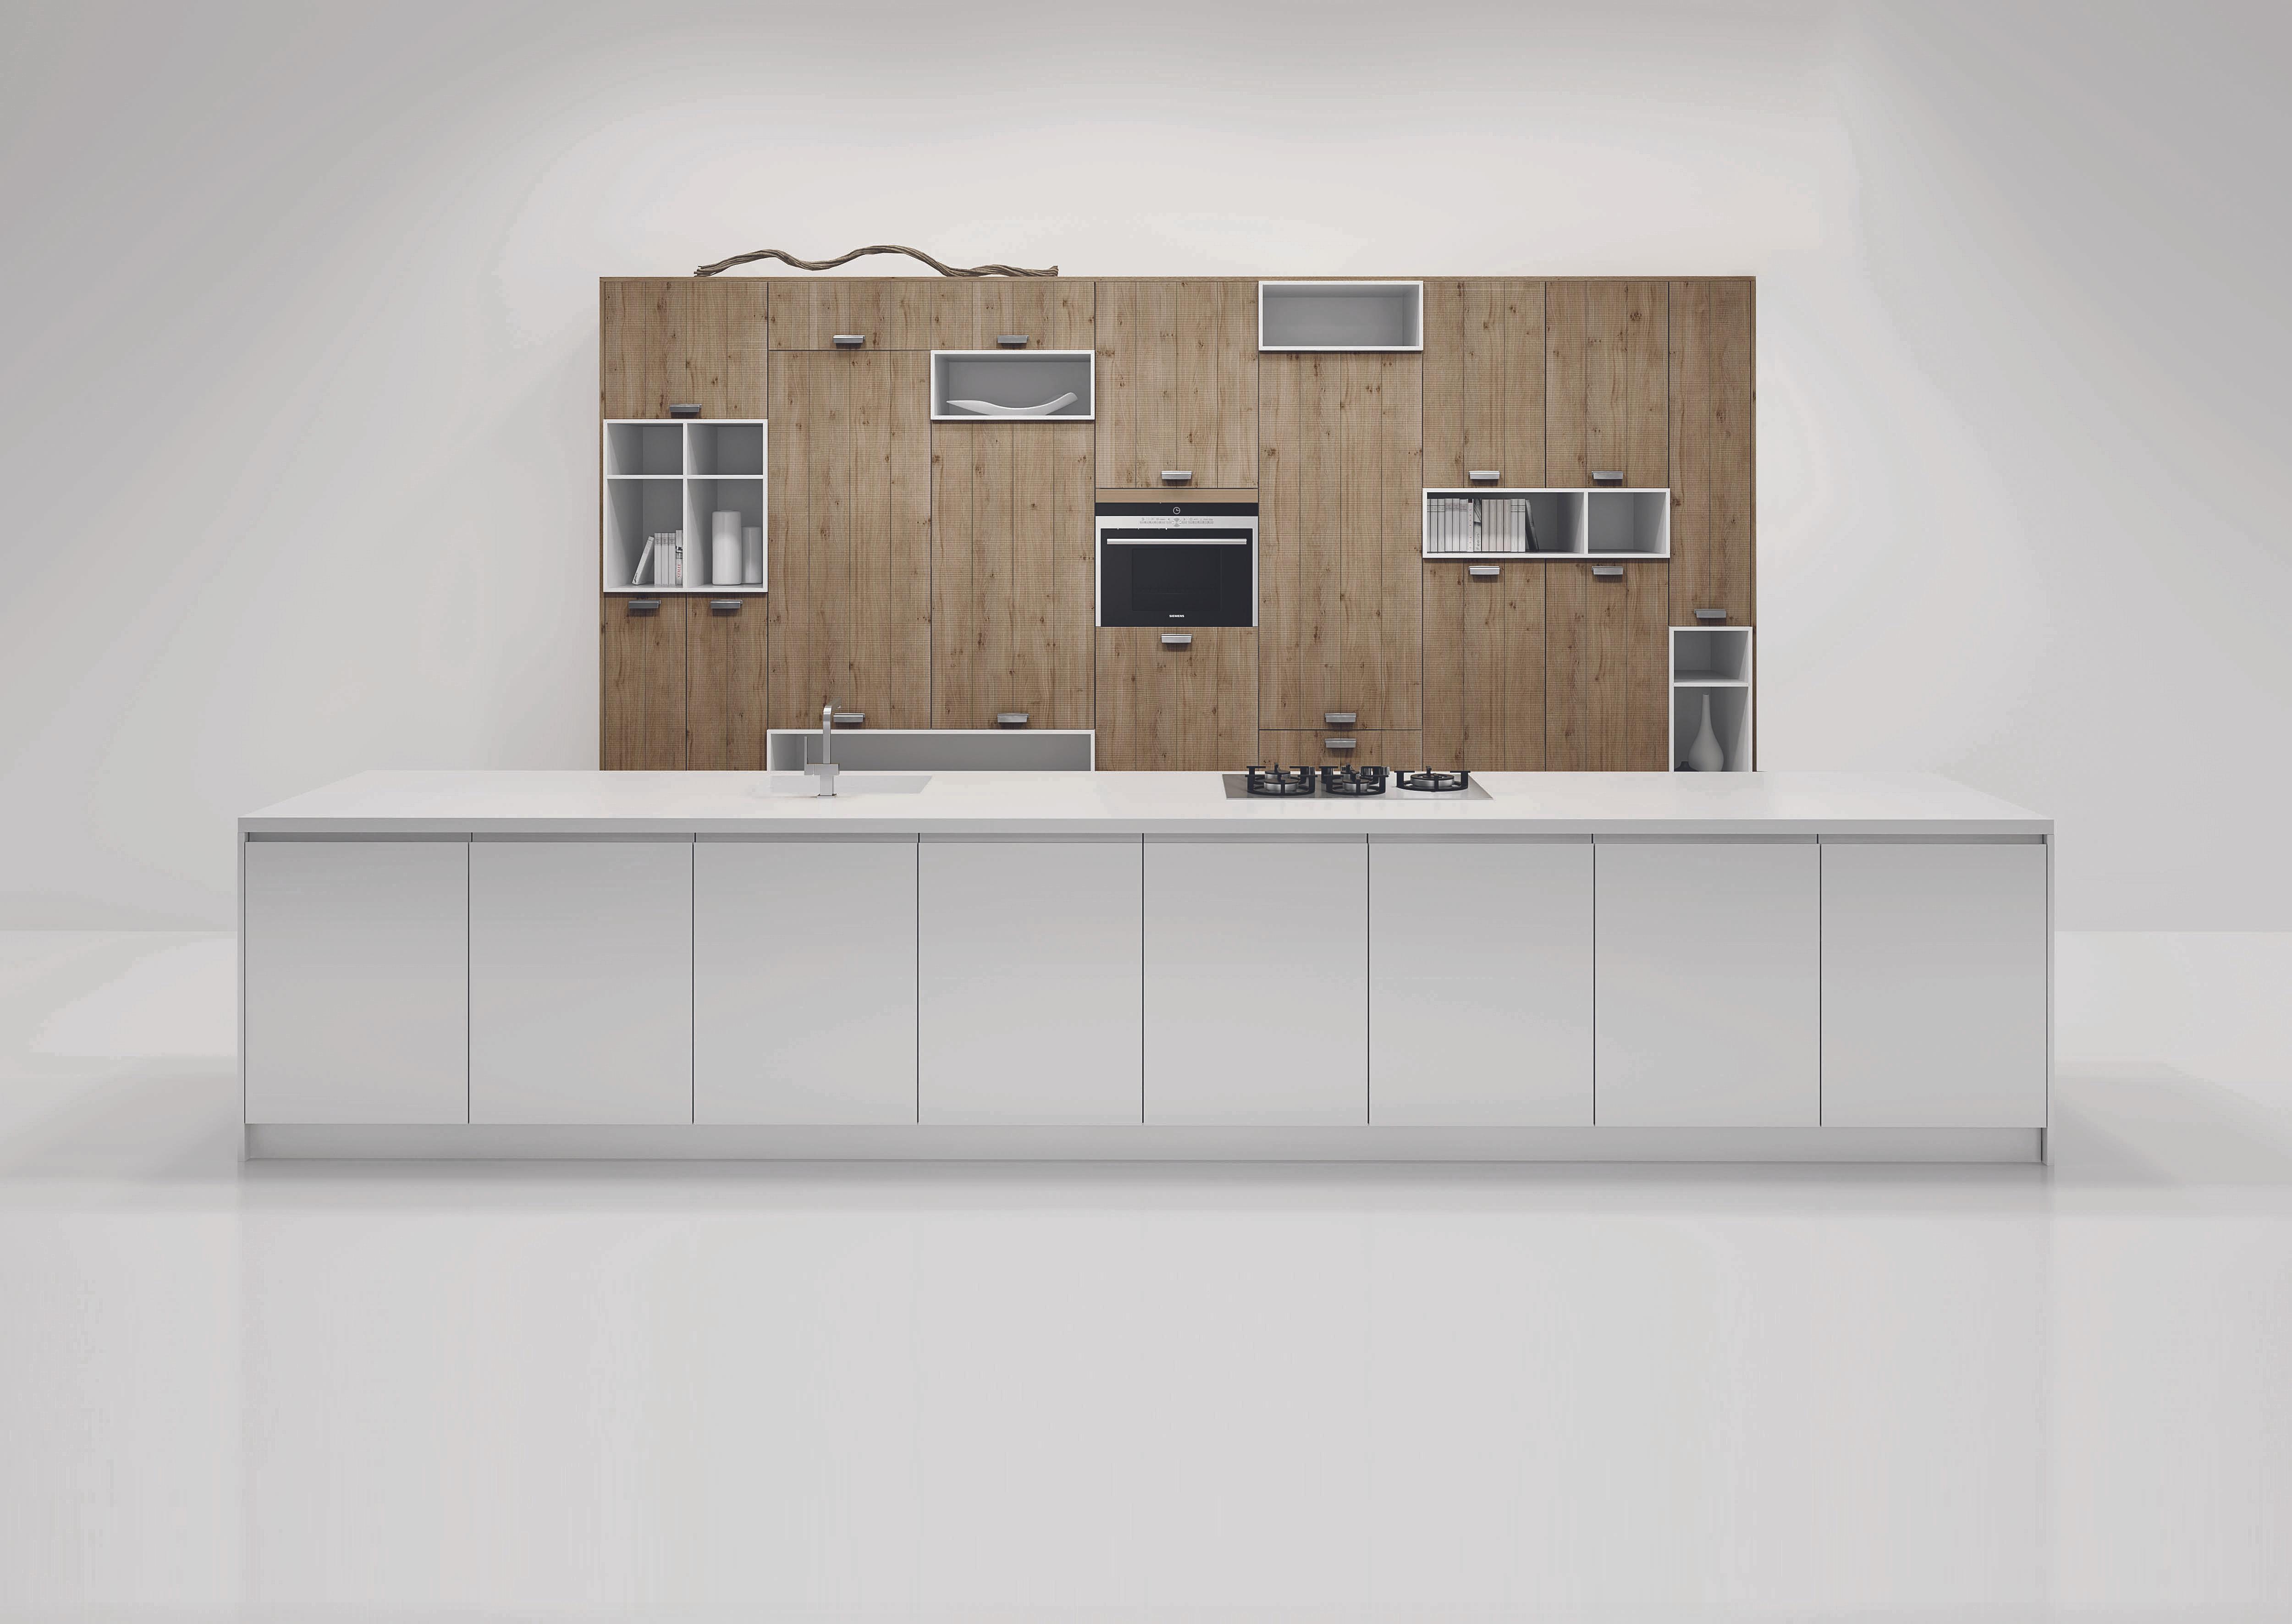 M R Kitchen Design Mrkitchen Furniture Chalfont St Siematic Sq Lacquer Surfaces